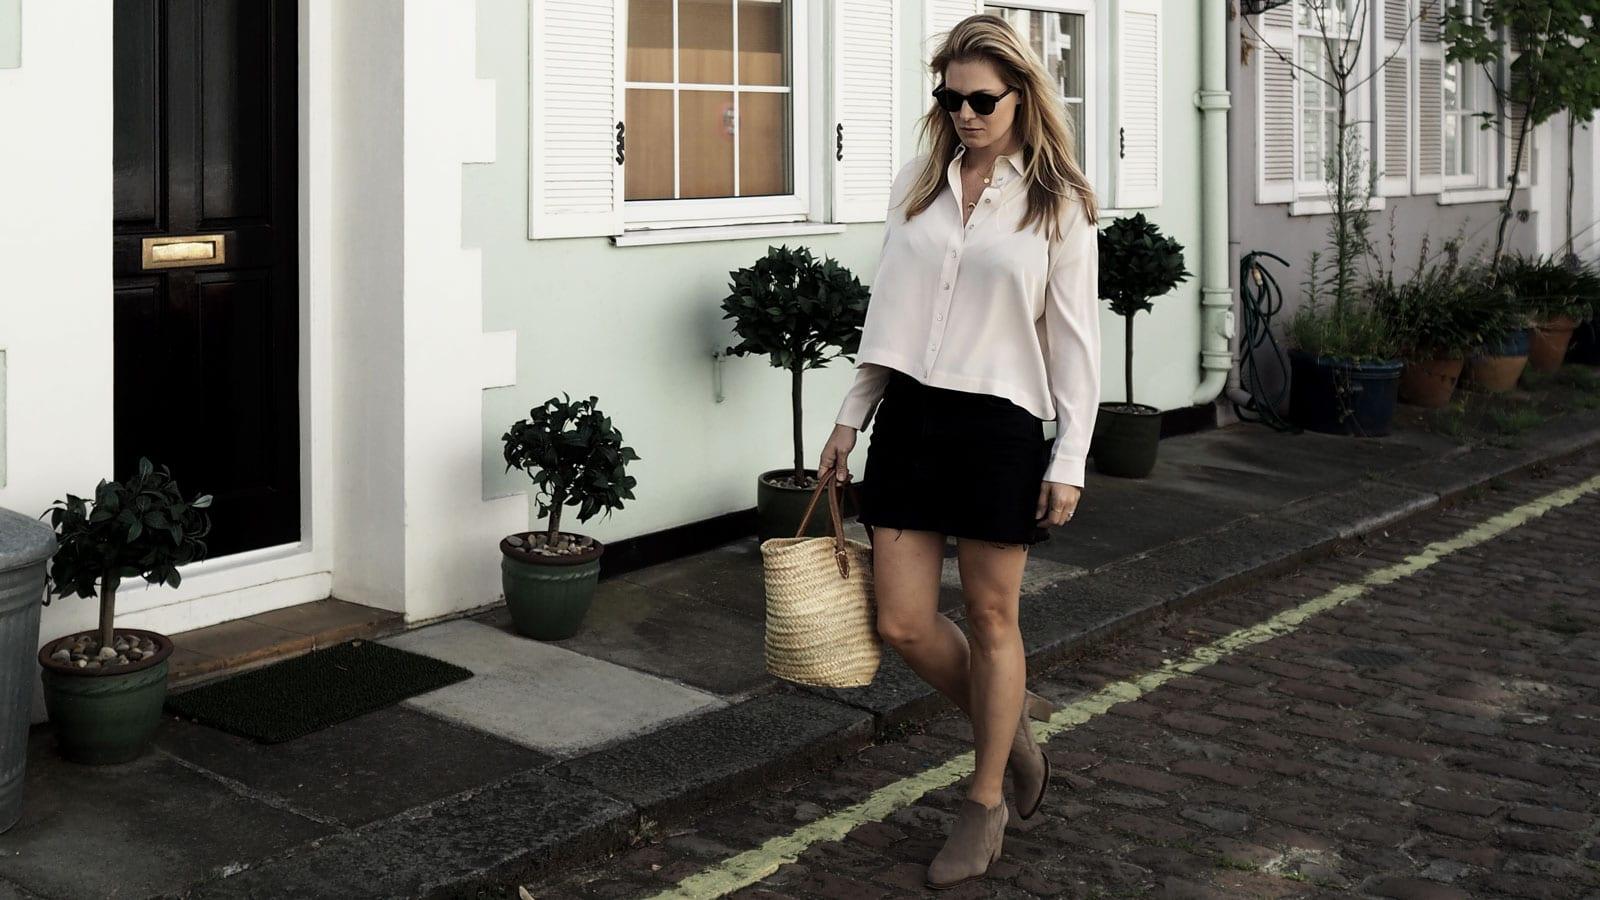 Style&Minimalism | It's Personal | Wearing ME+EM Silk Blouse, Topshop Black Denim Skirt & Straw Bag